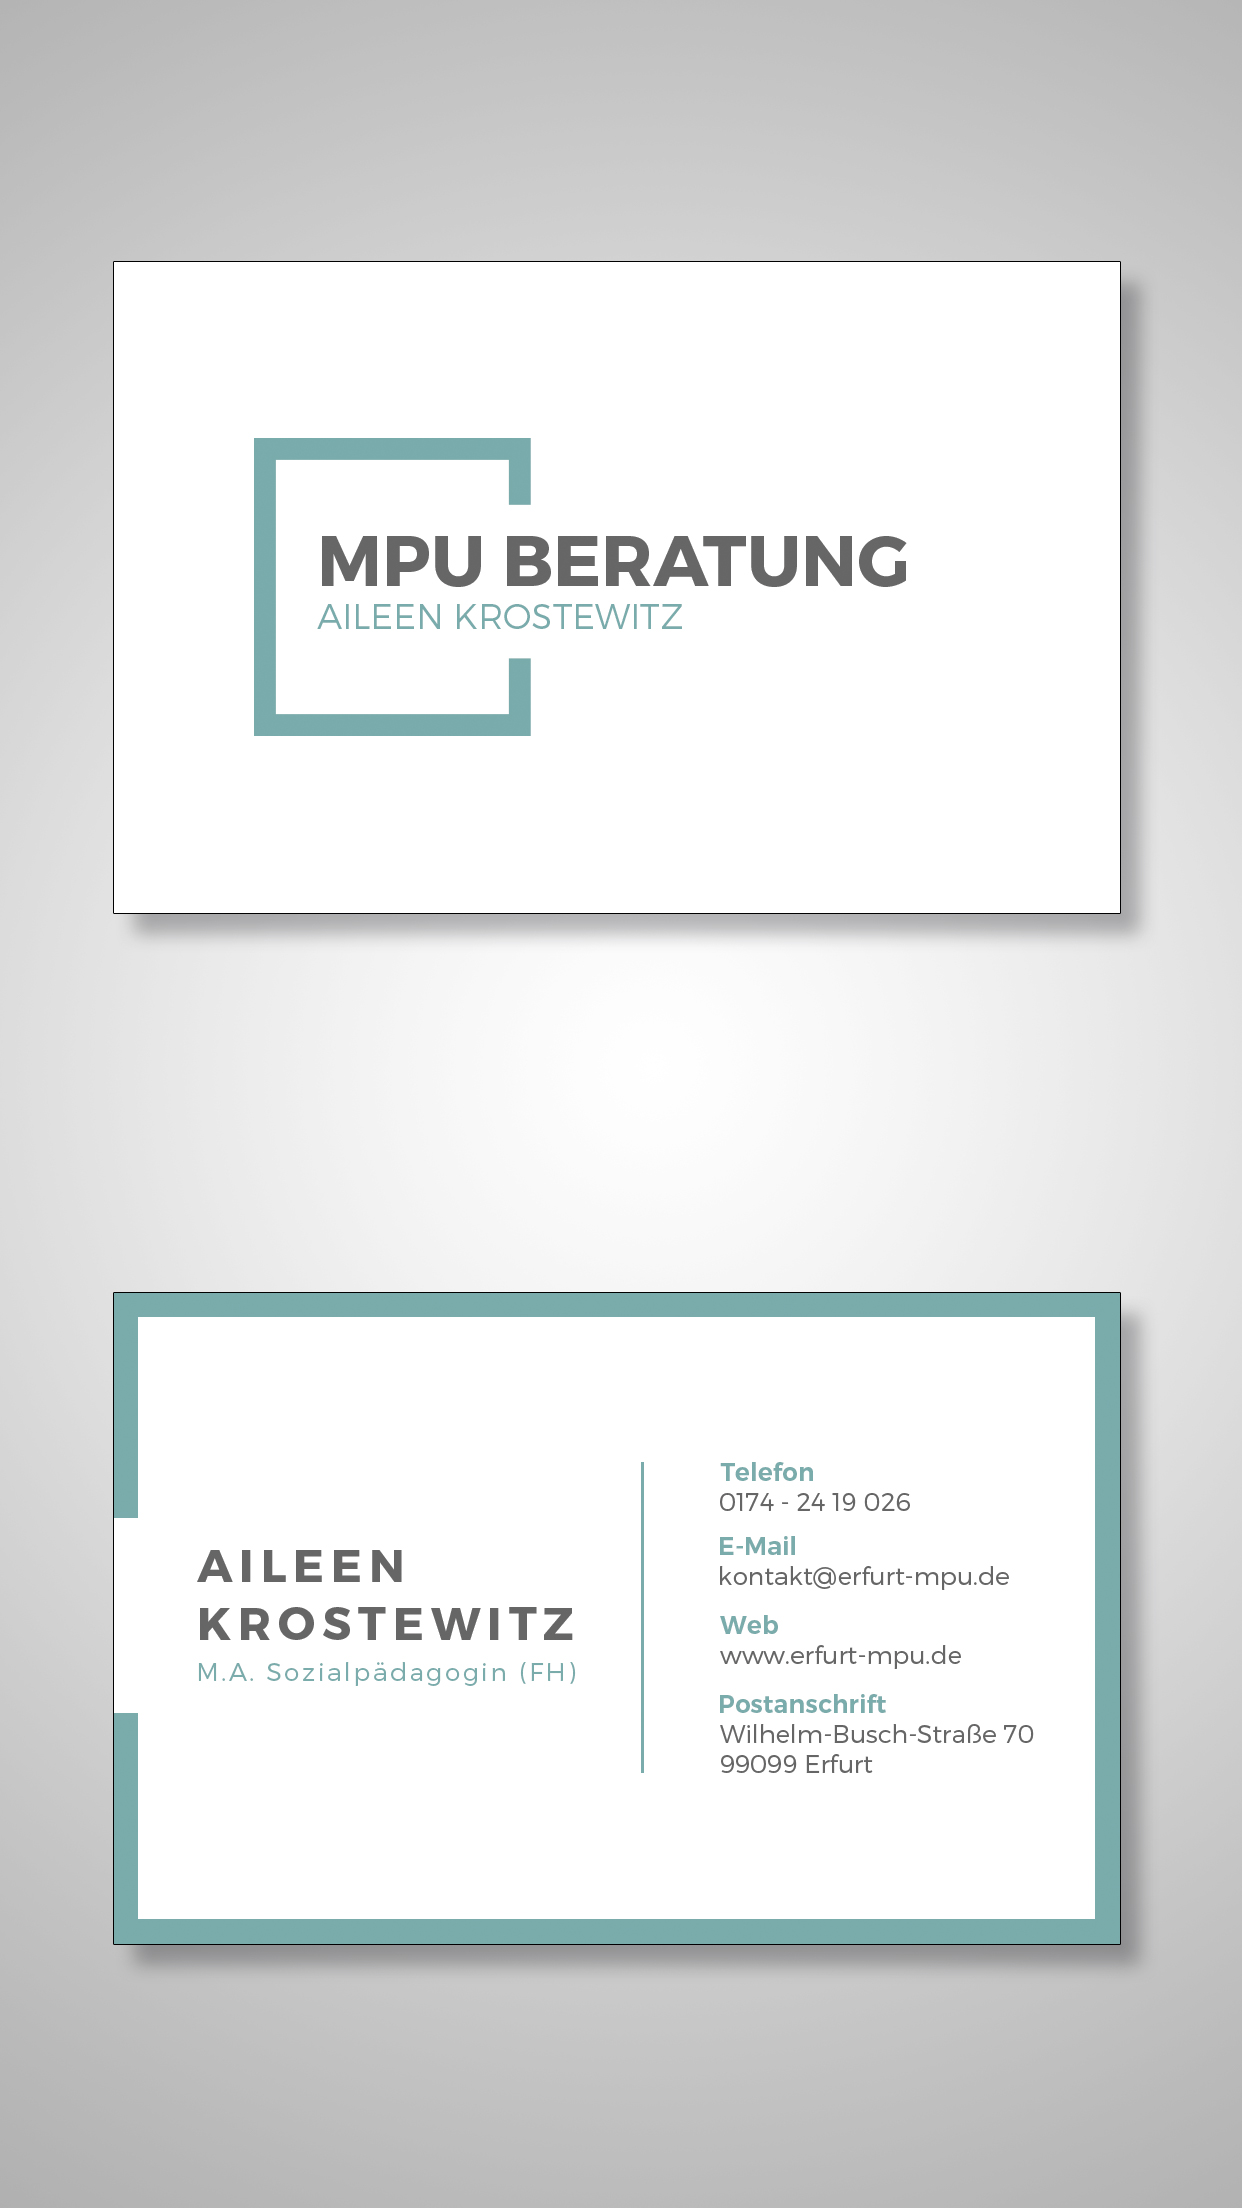 Visitenkarten Mpu Beratung Erfurt Aileen Krostewitz Art